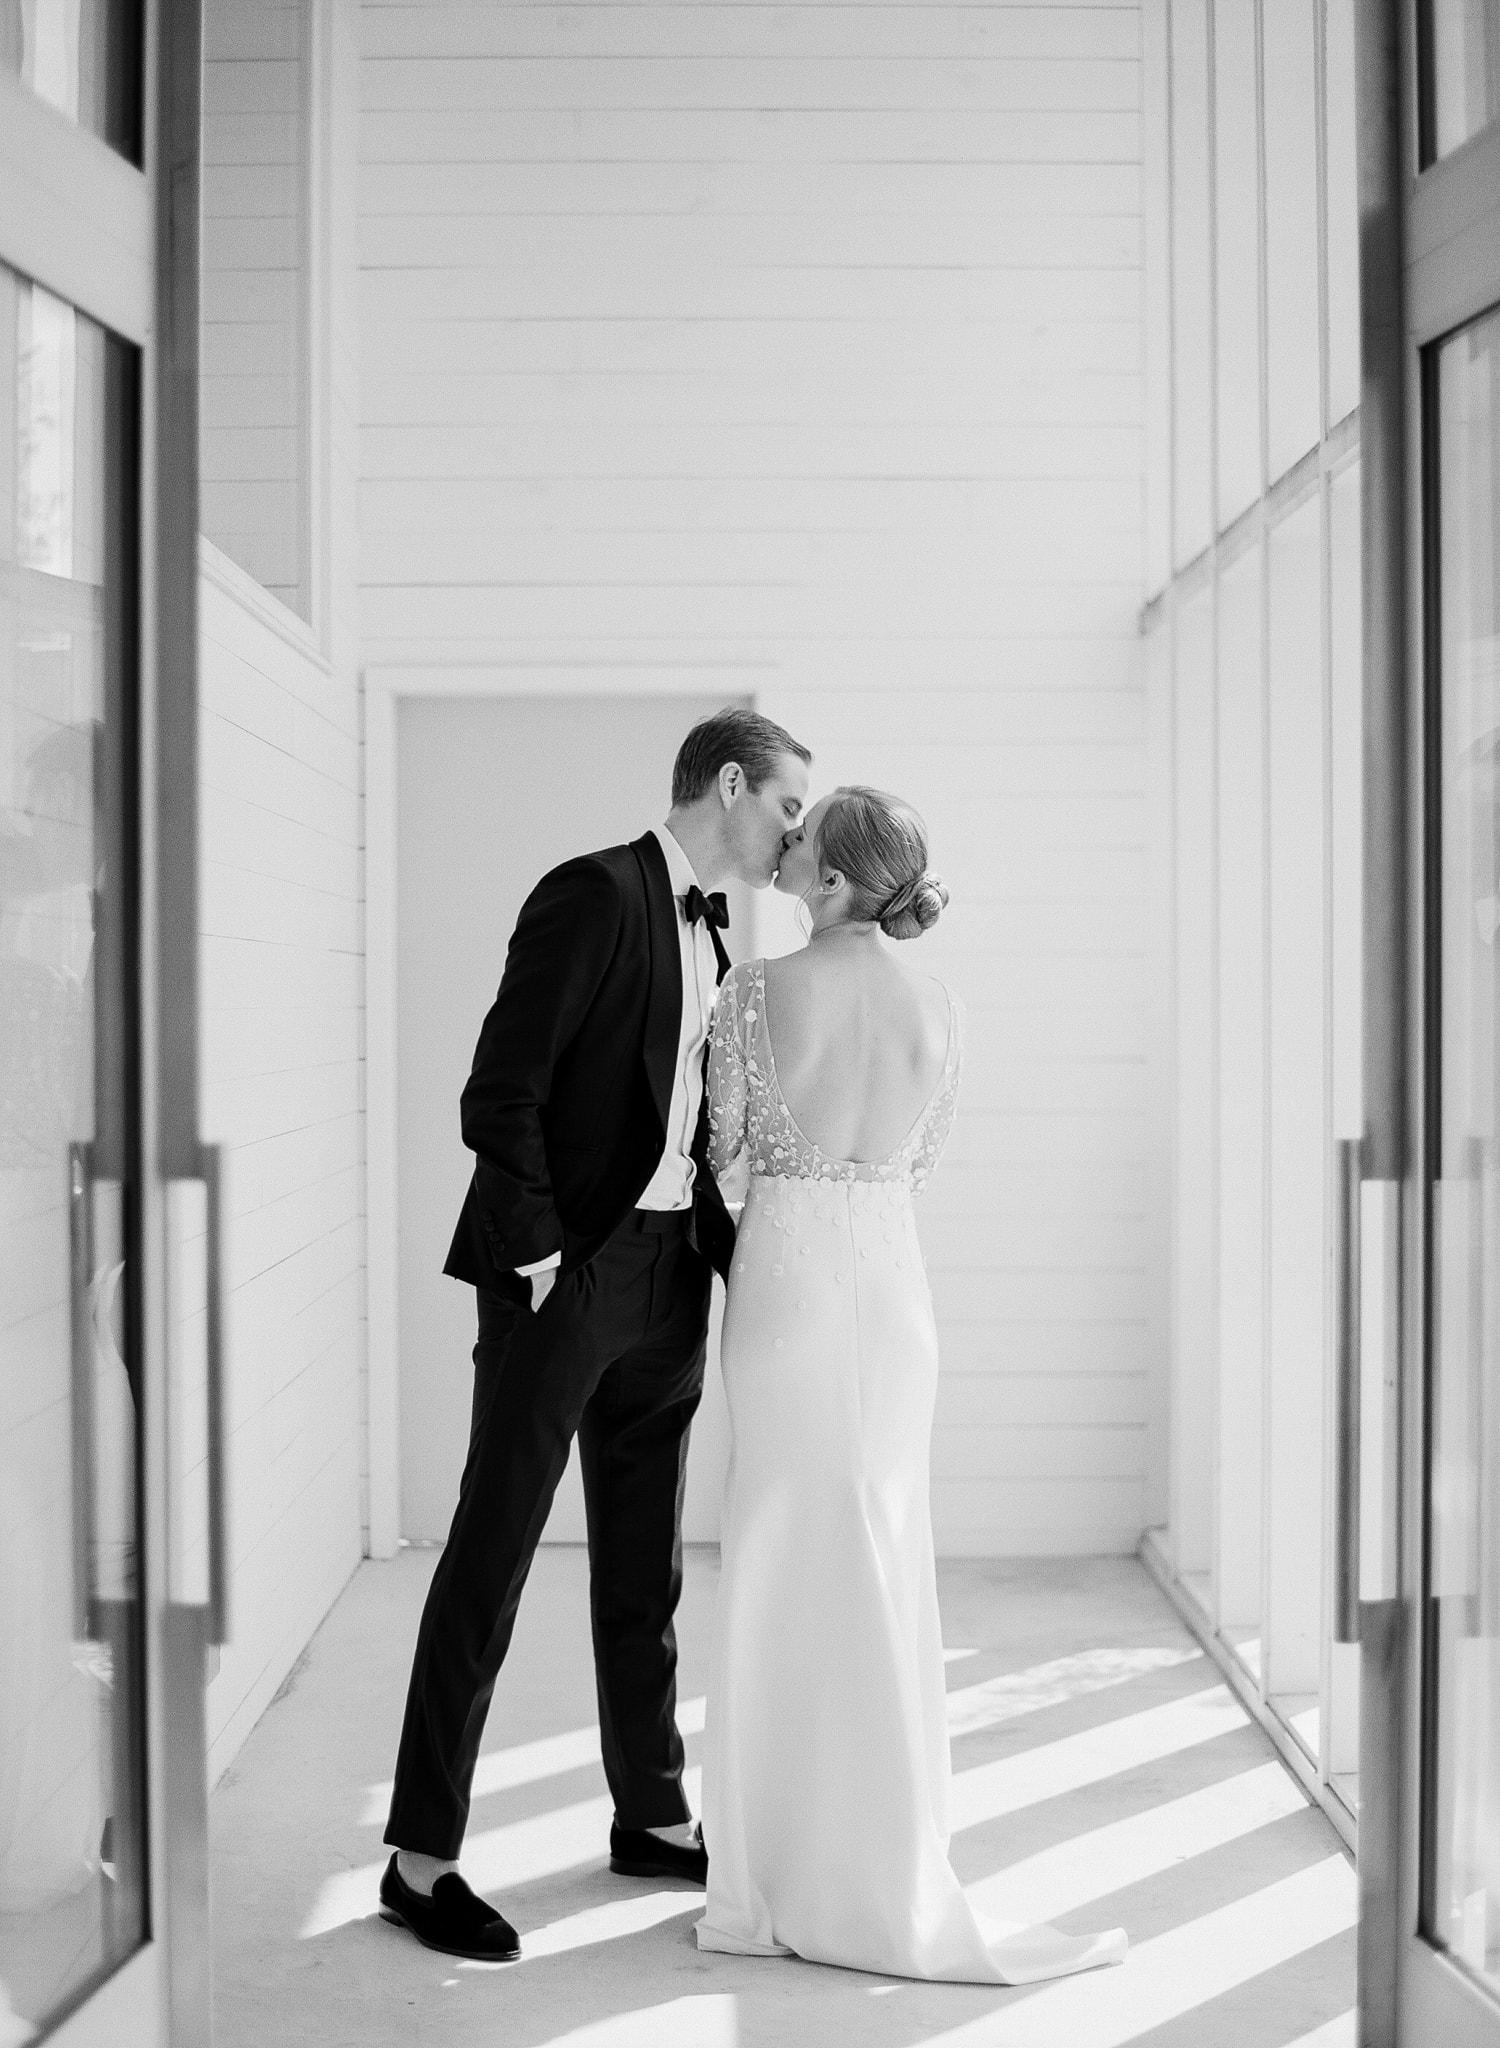 prospect-house-wedding-15.jpg